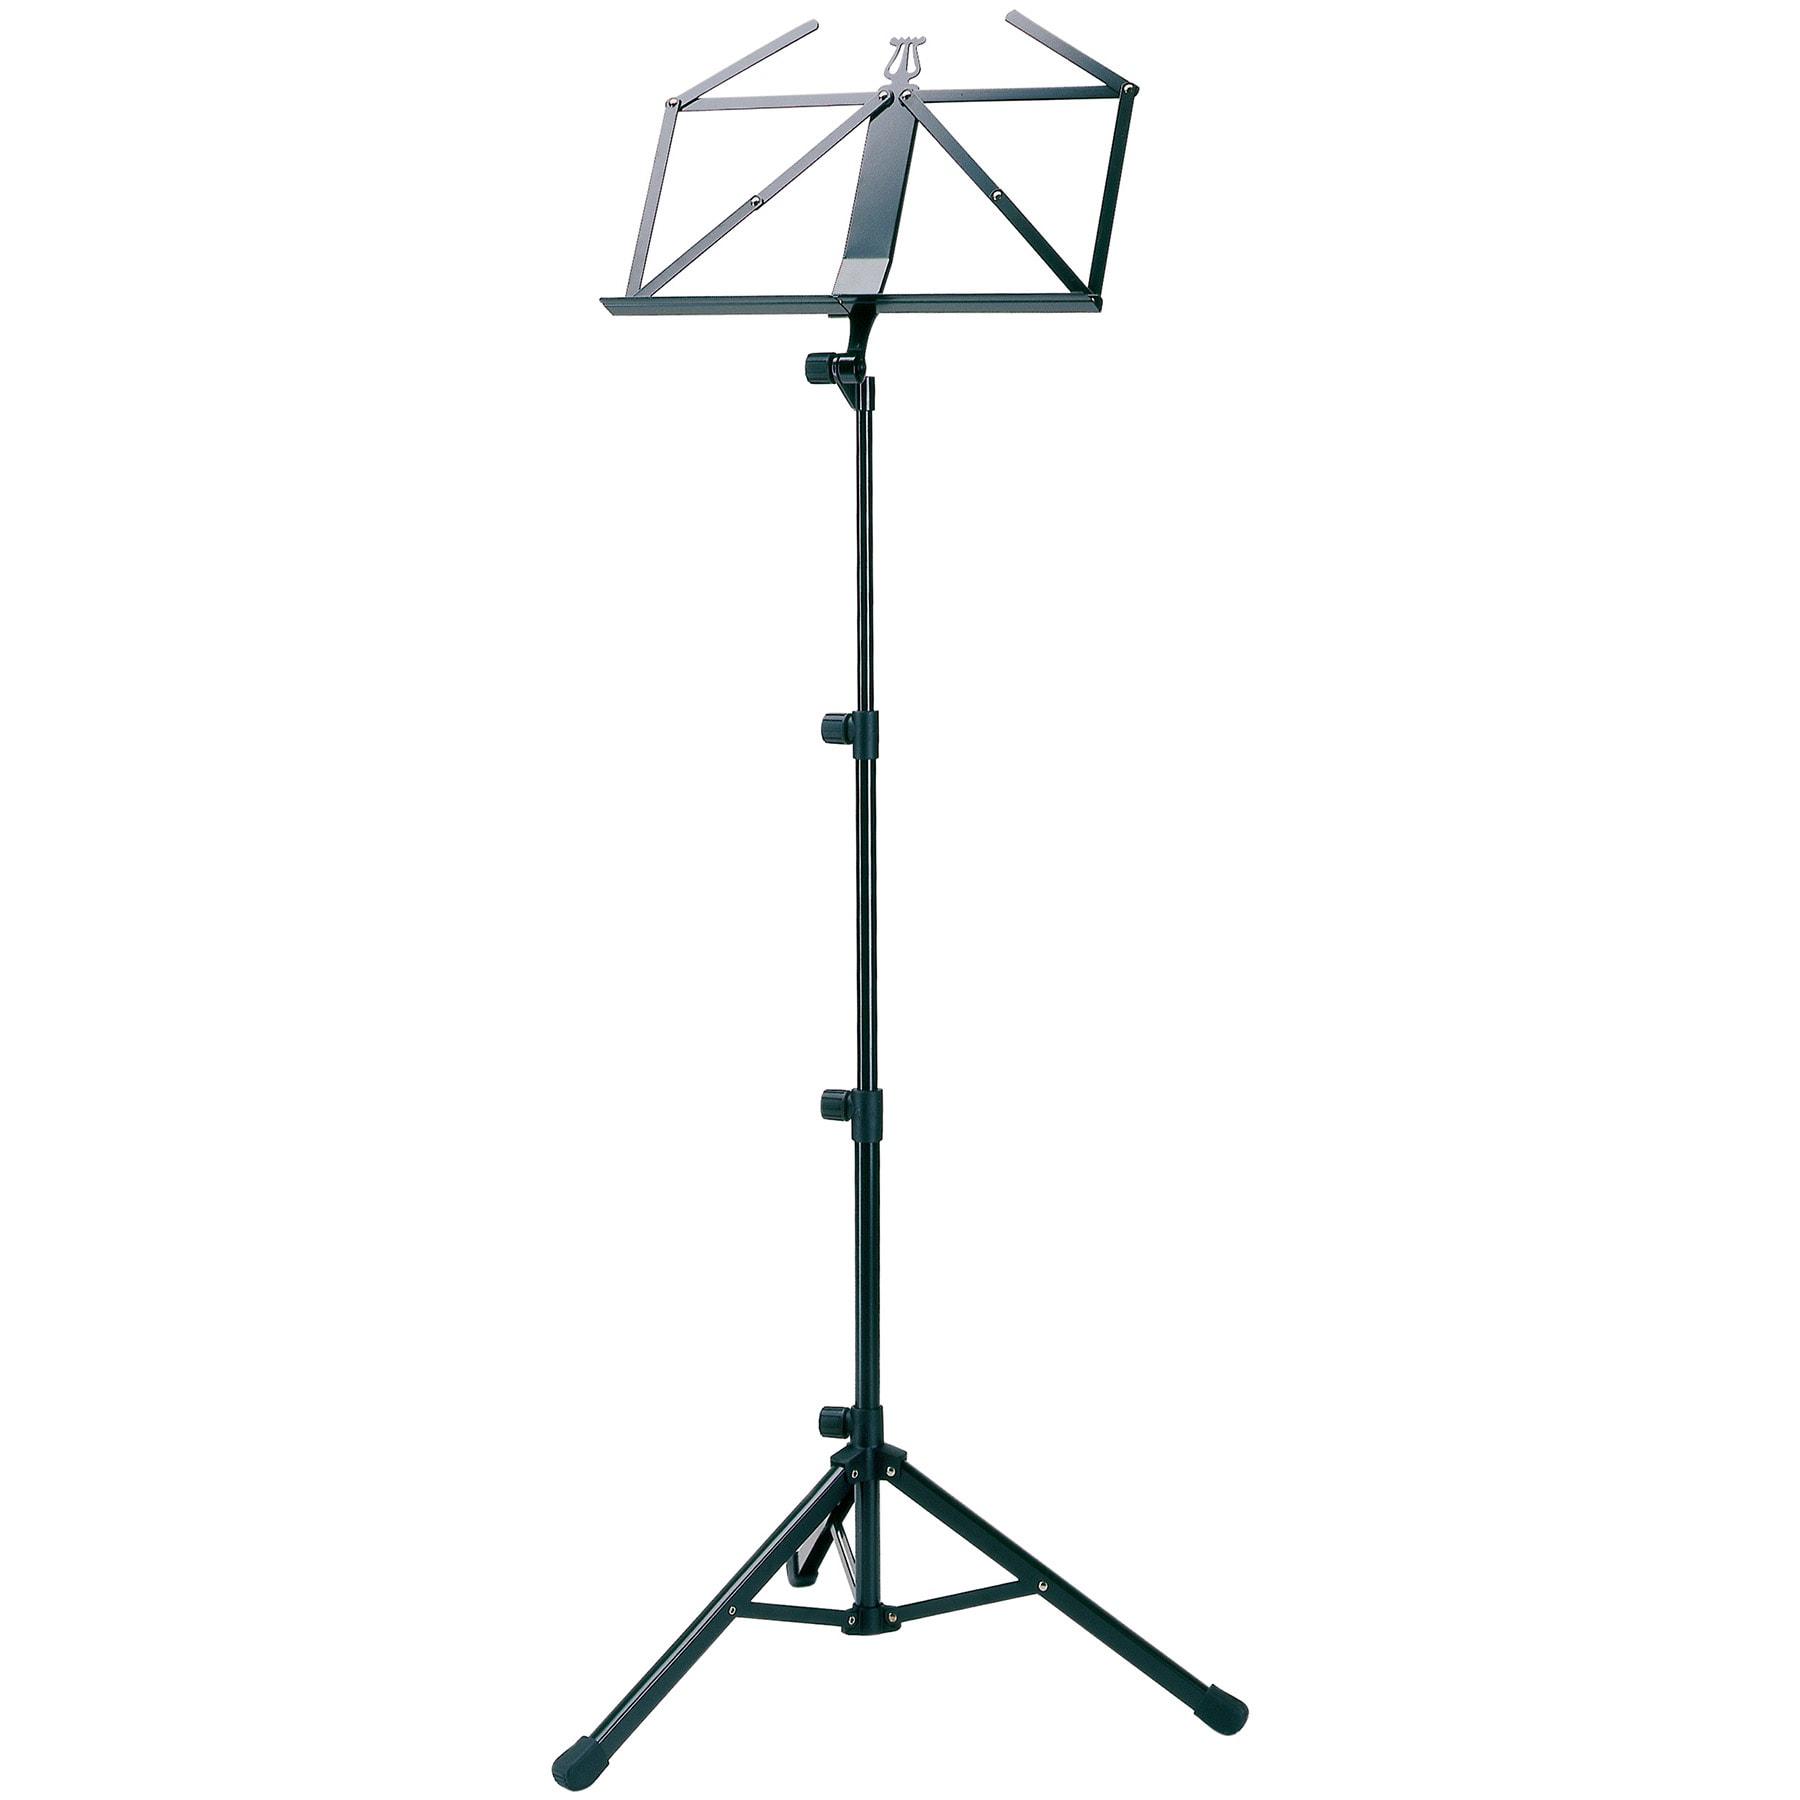 KM10810 - Music stand